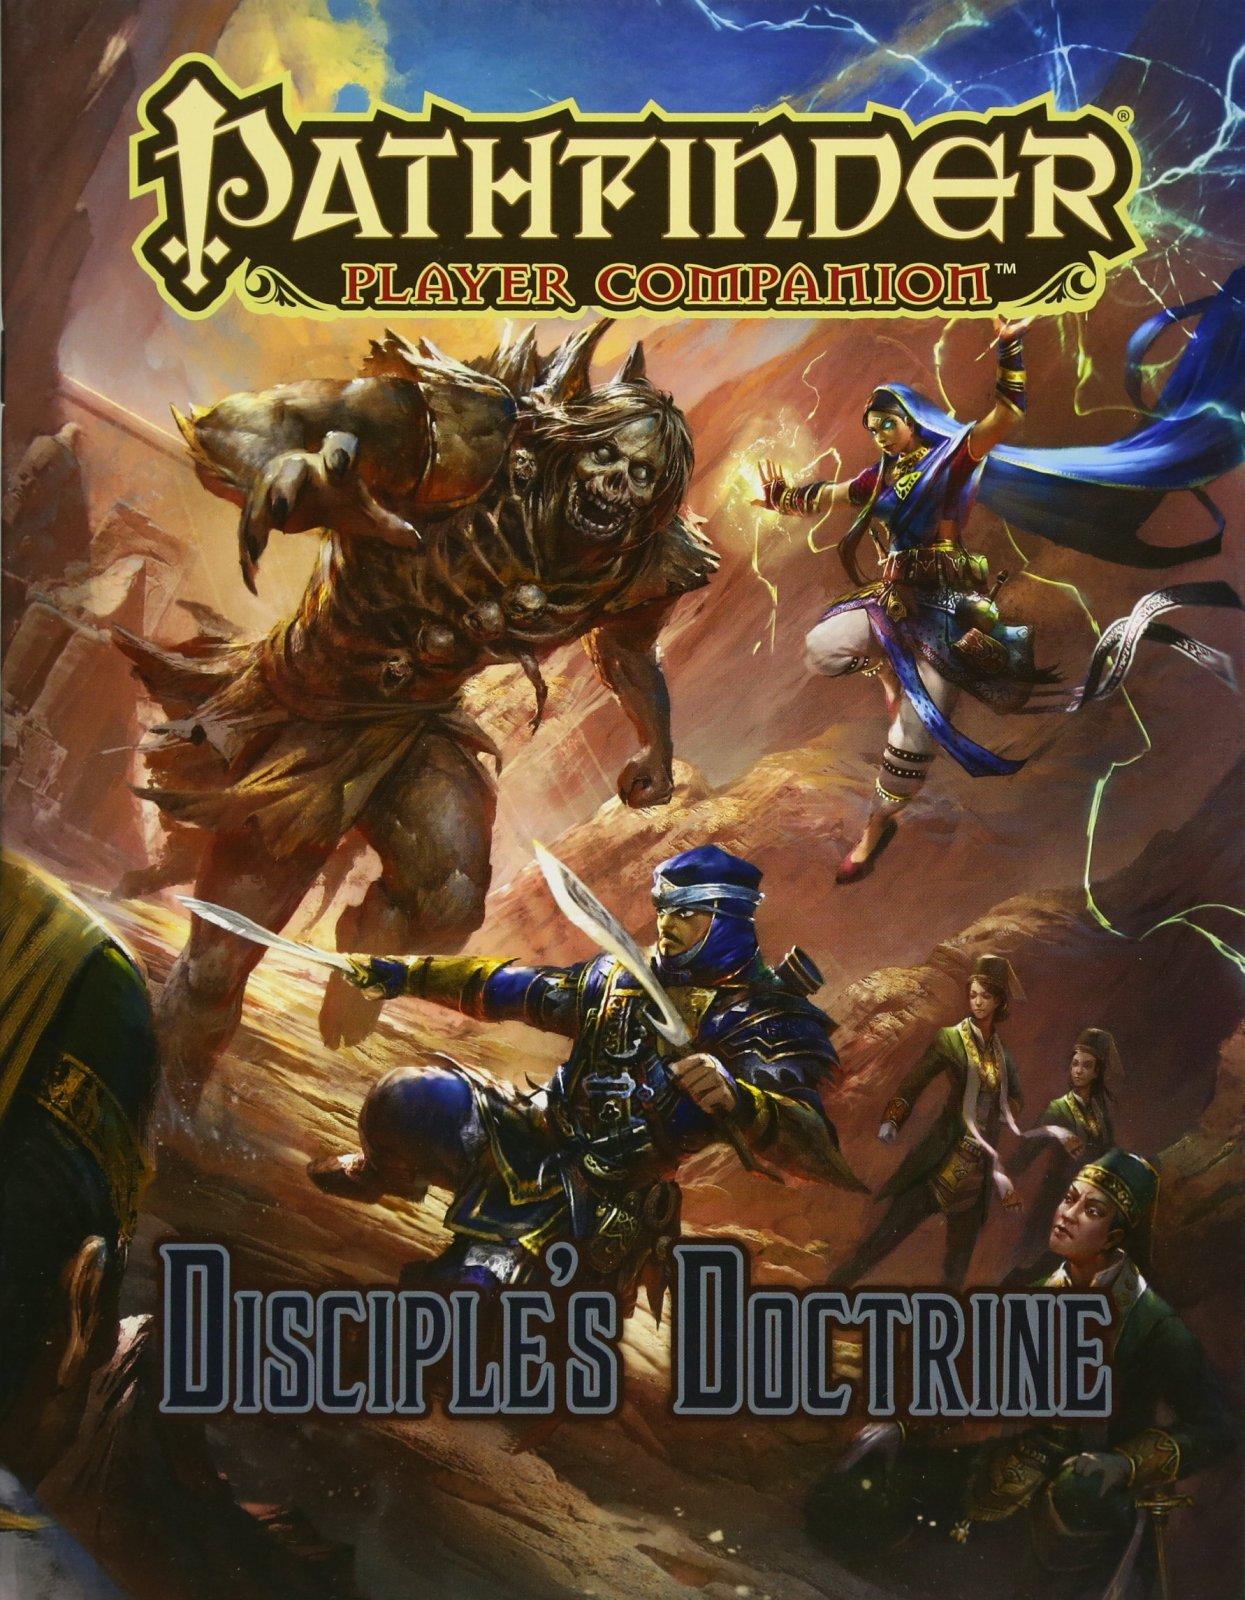 Desciple's Doctrine - Pathfinder Player Companion